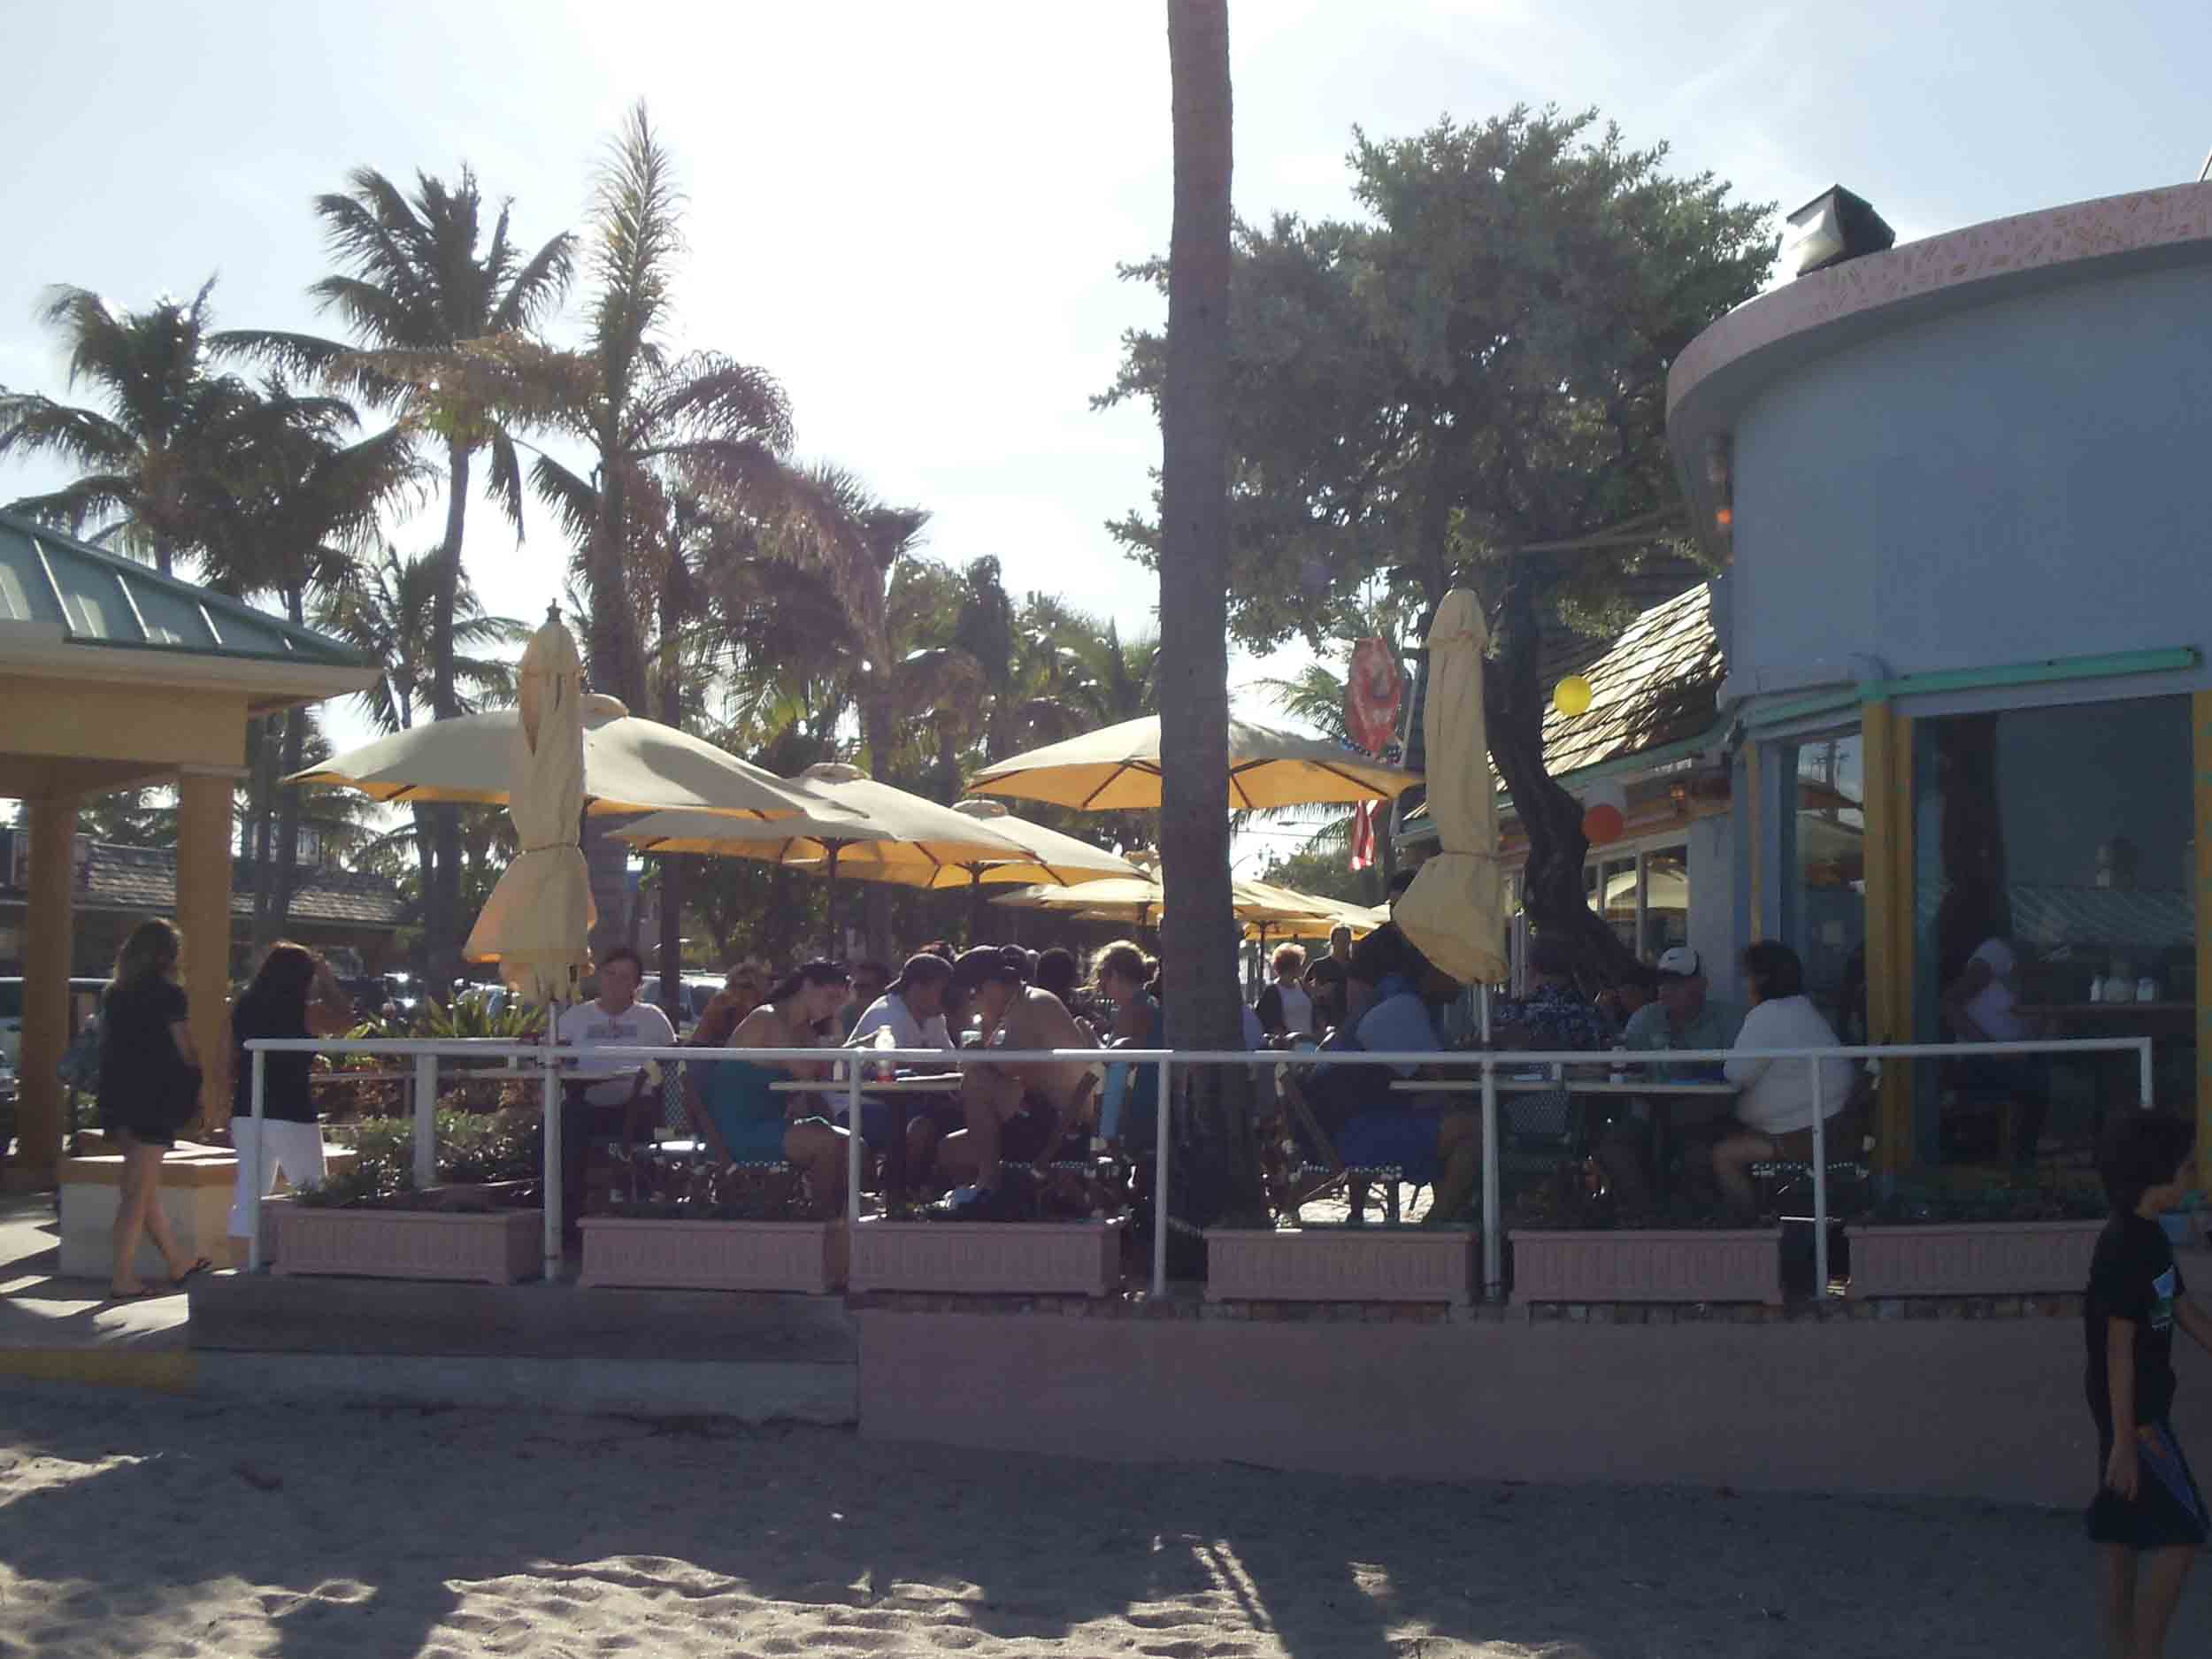 Aruba Beach Cafe Patio